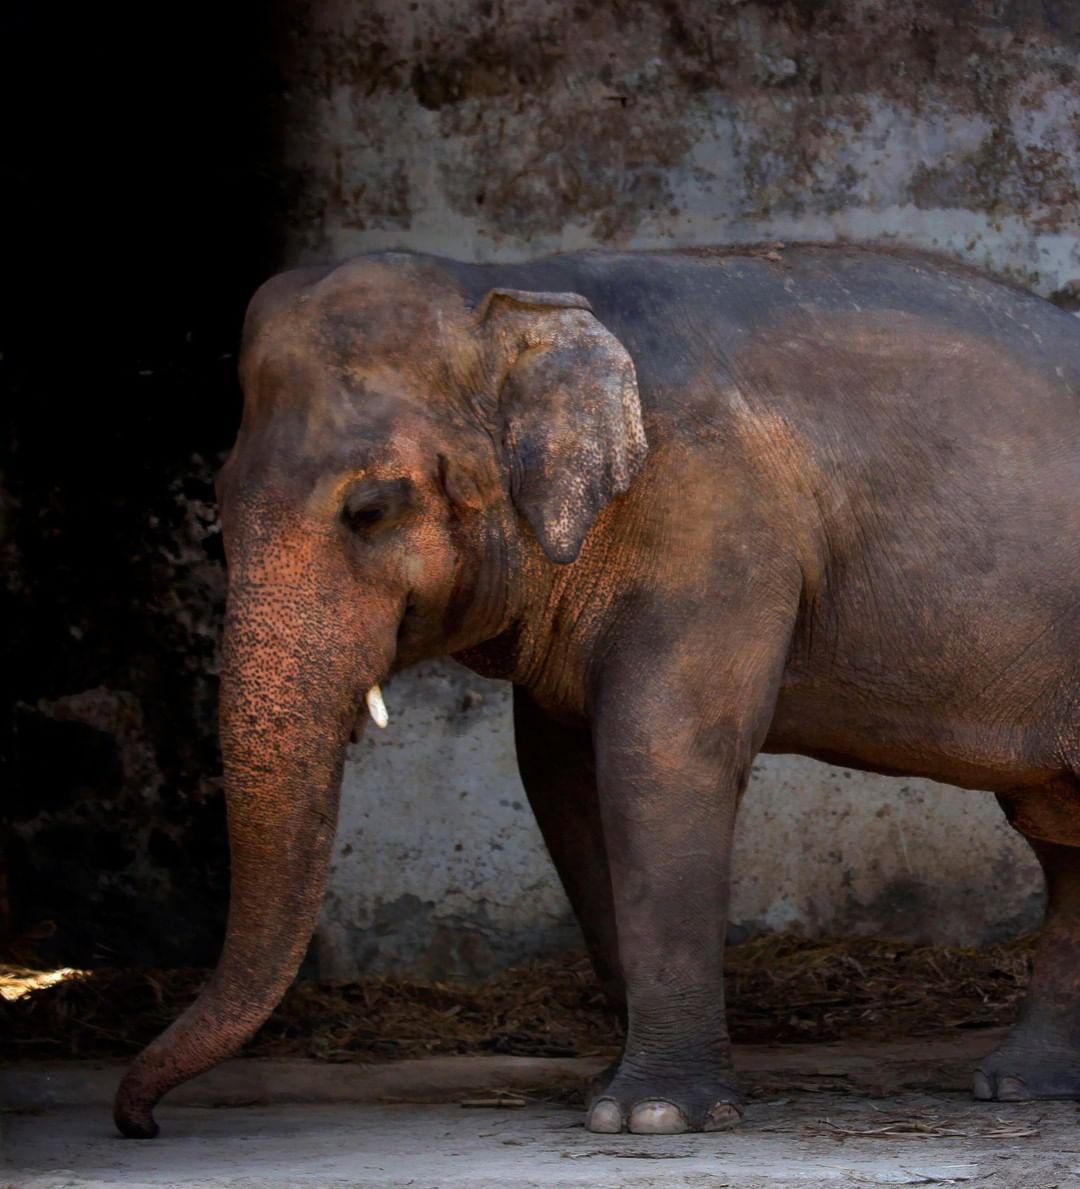 elefante encerrado